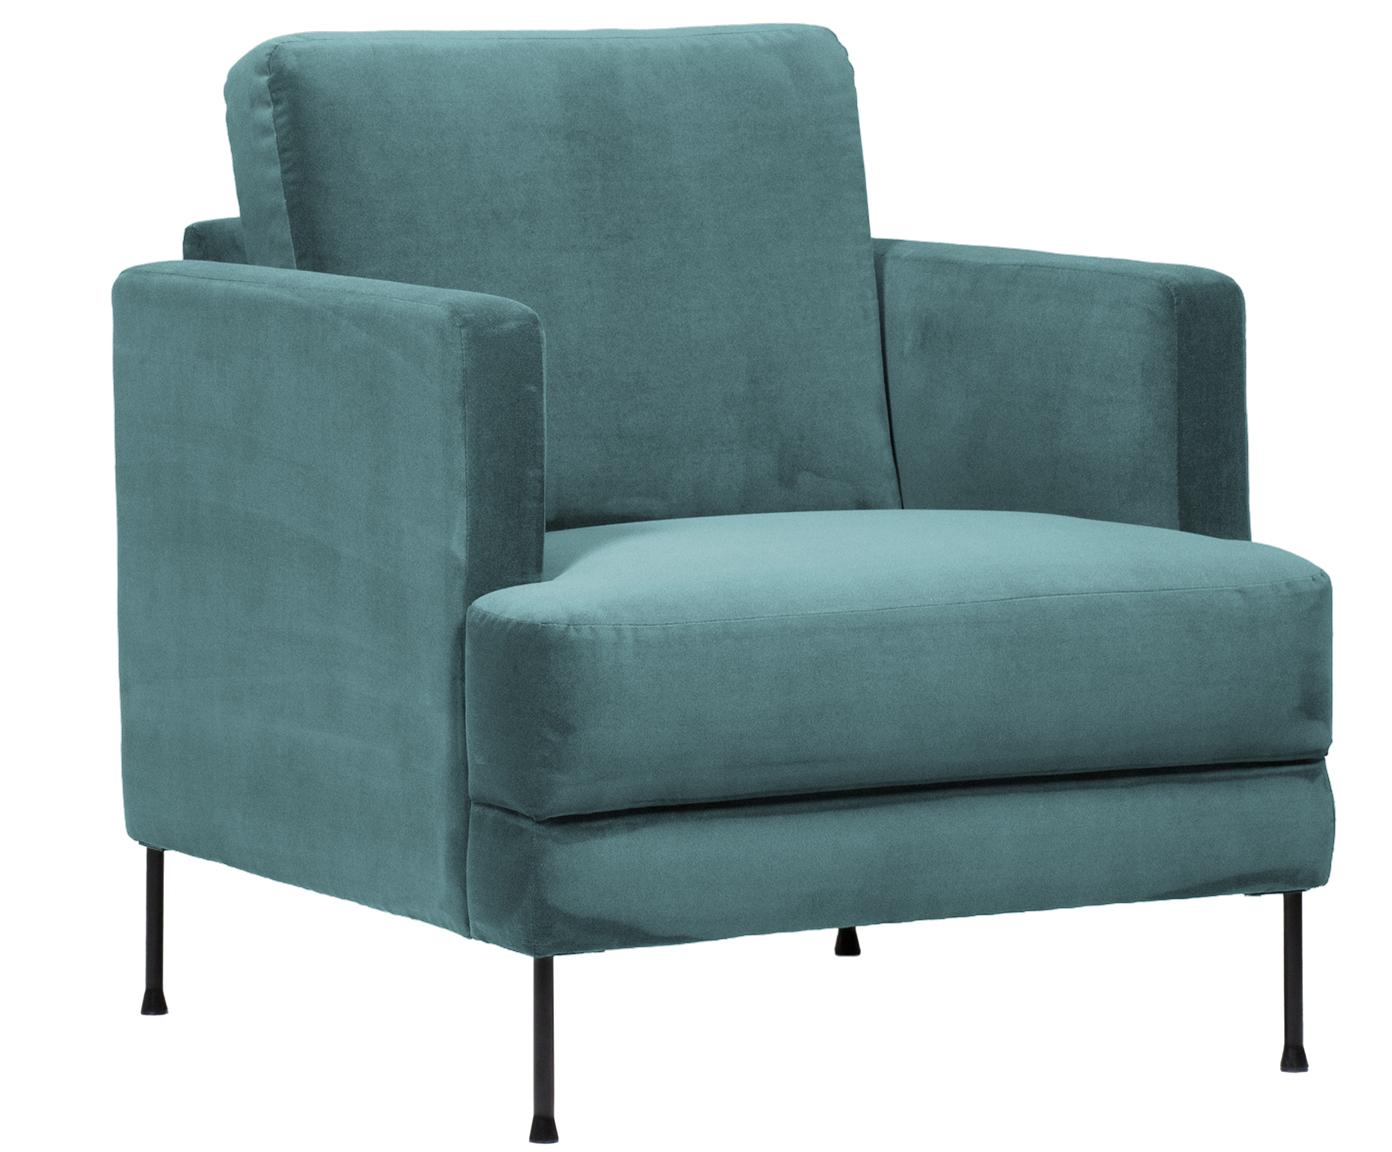 Samt-Sessel Fluente, Bezug: Samt (Polyester) 100.000 , Gestell: Massives Kiefernholz, Samt Blau, B 76 x T 83 cm